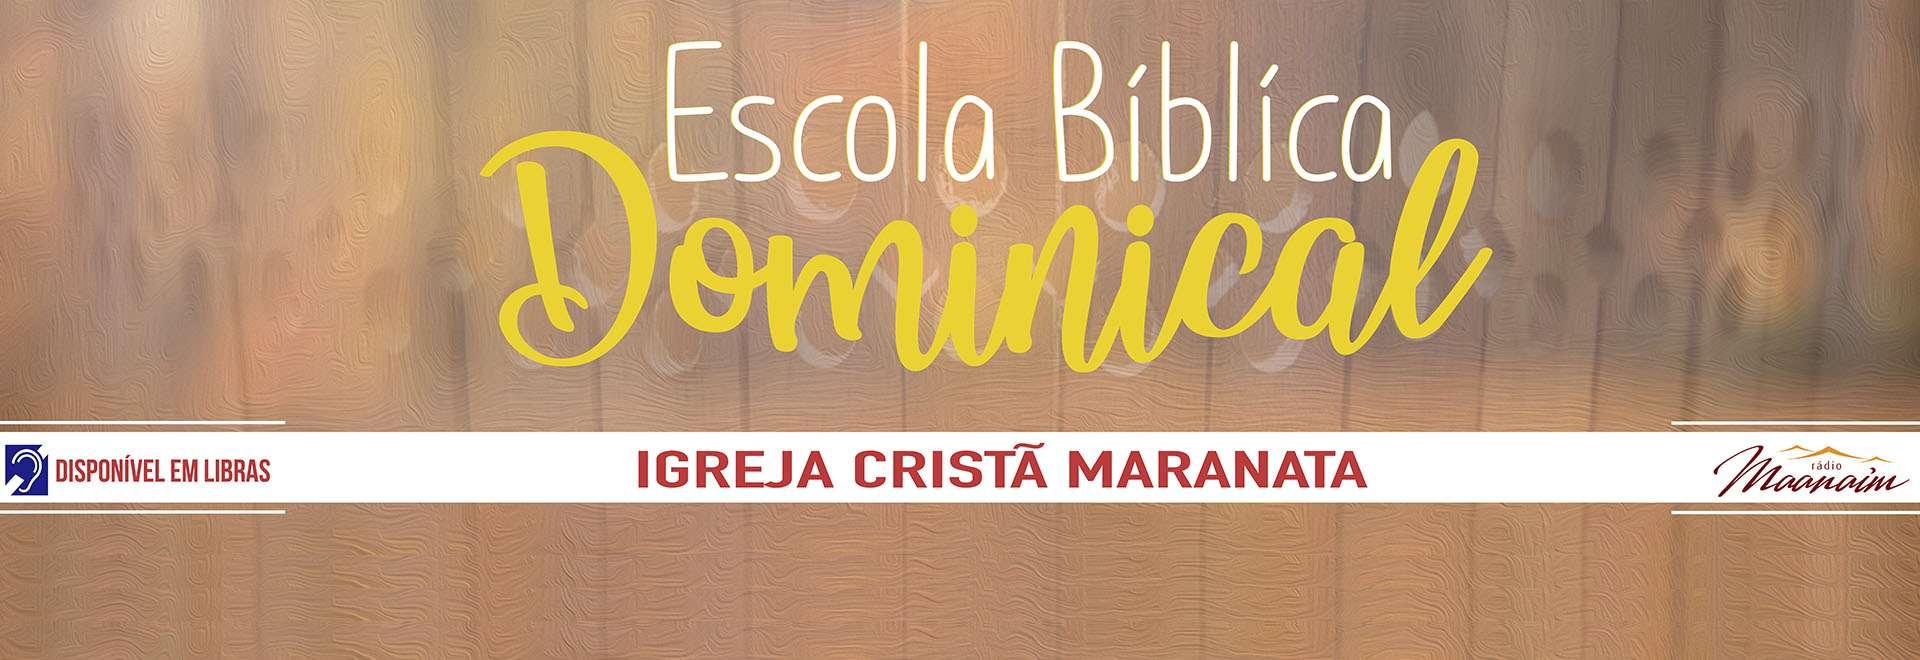 Participações da EBD da Igreja Cristã Maranata - 27/12/2020